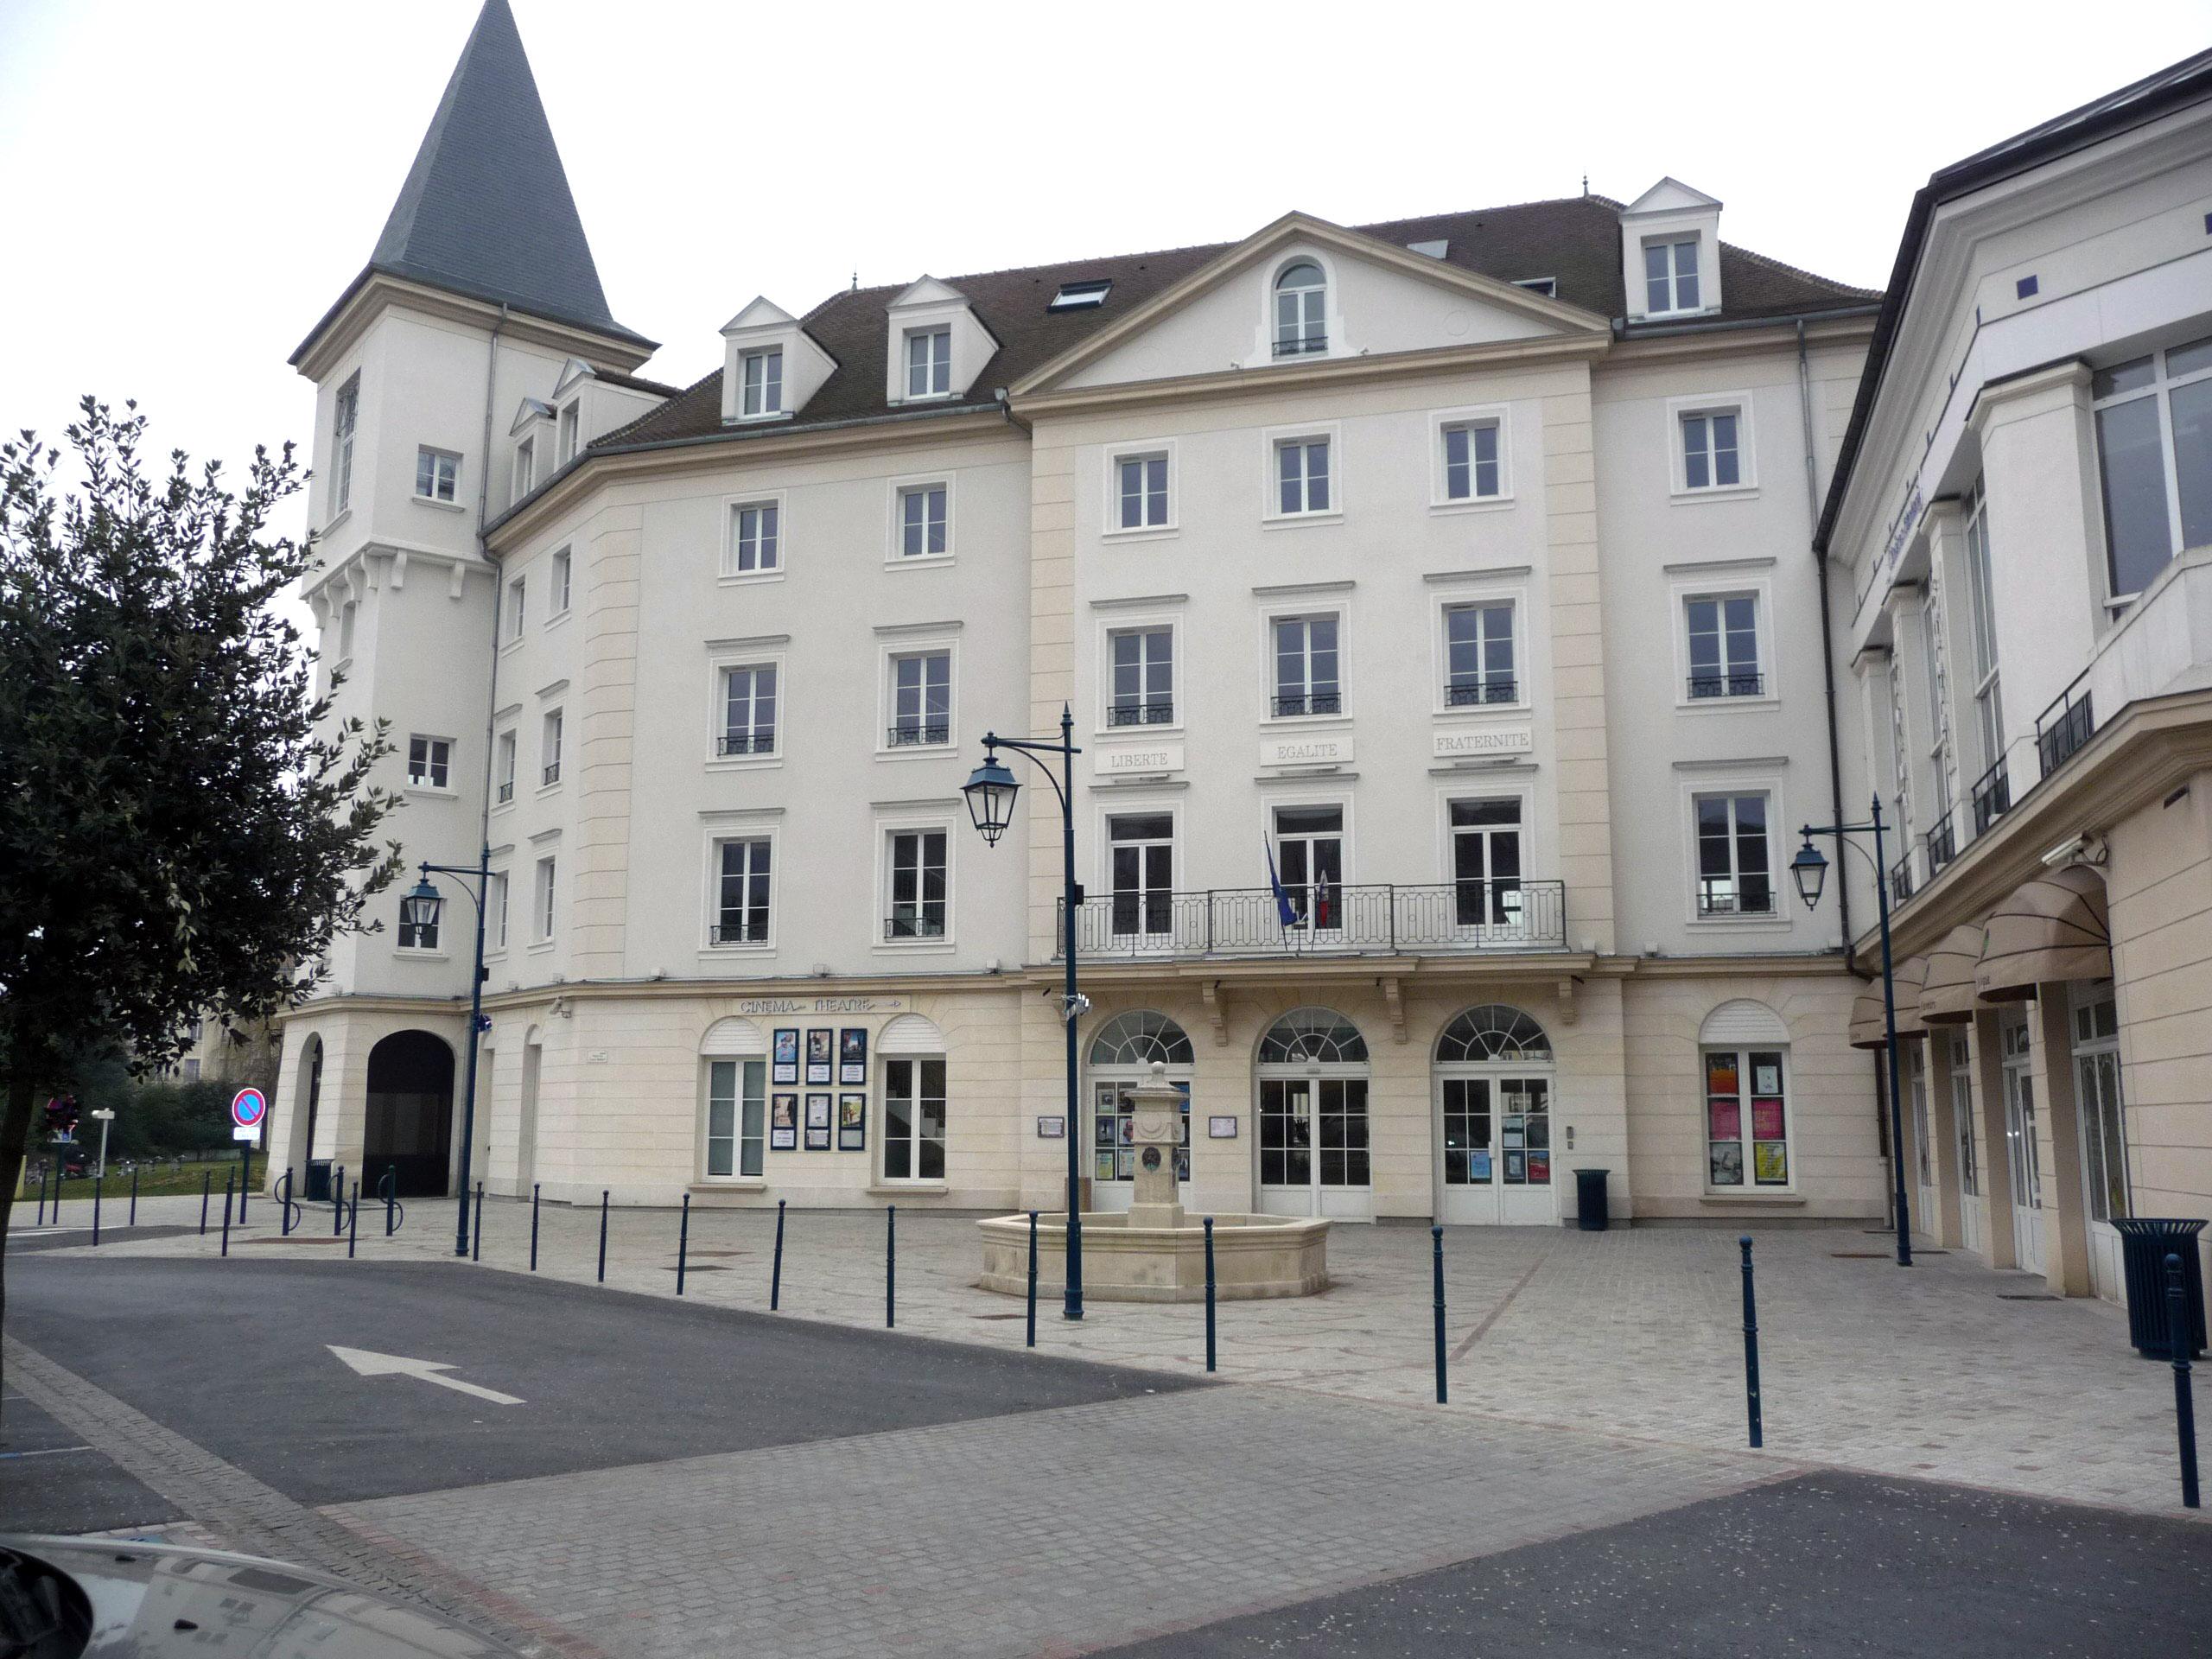 façade de la mairie de Vaureal